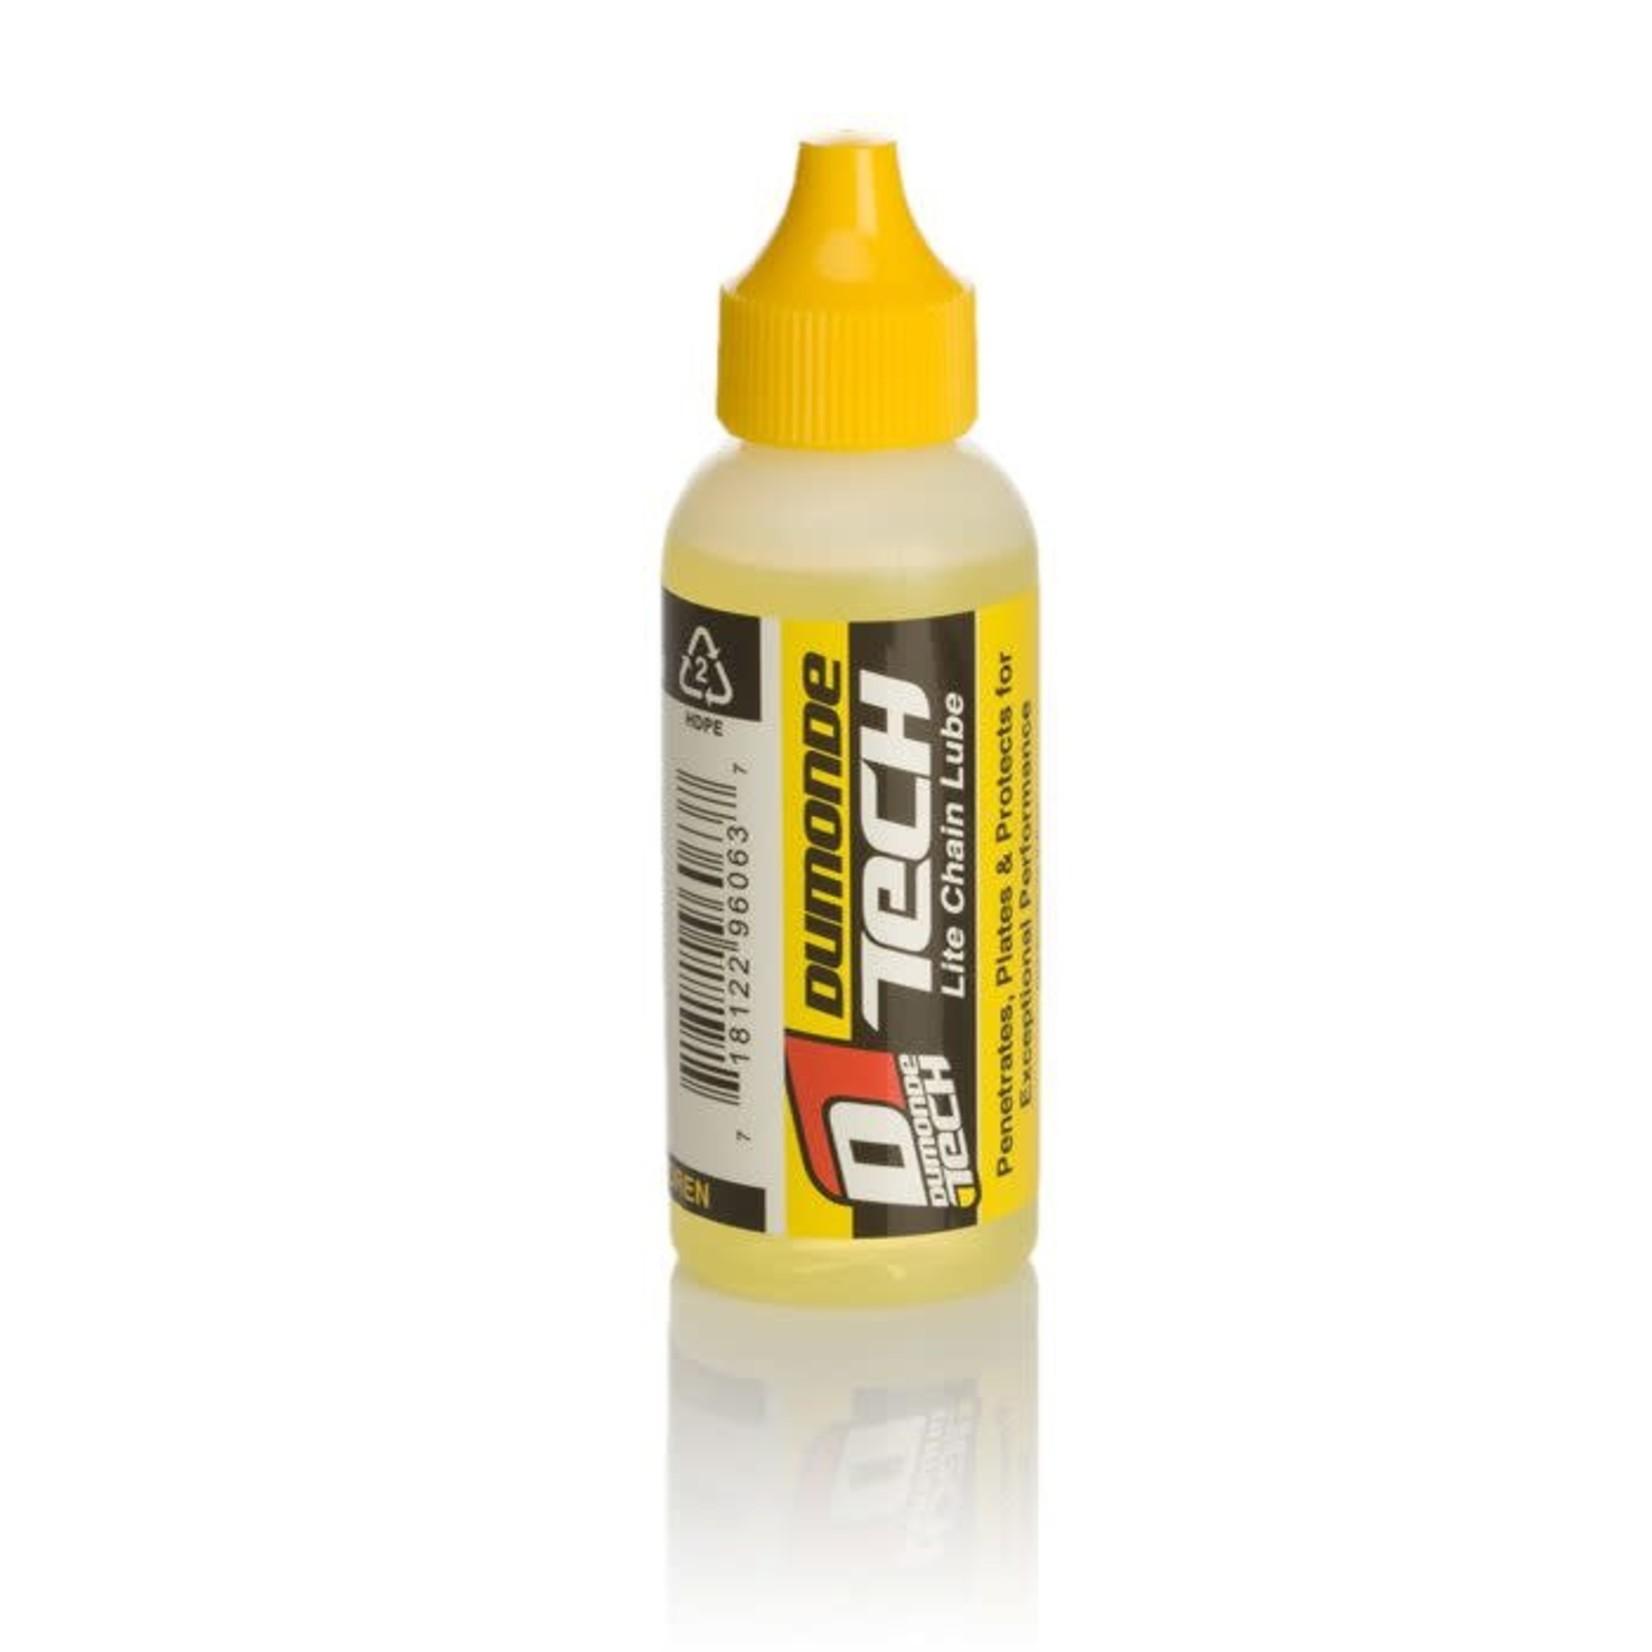 Dumonde Tech Dumonde Tech - Lite Formula BCL - 4oz